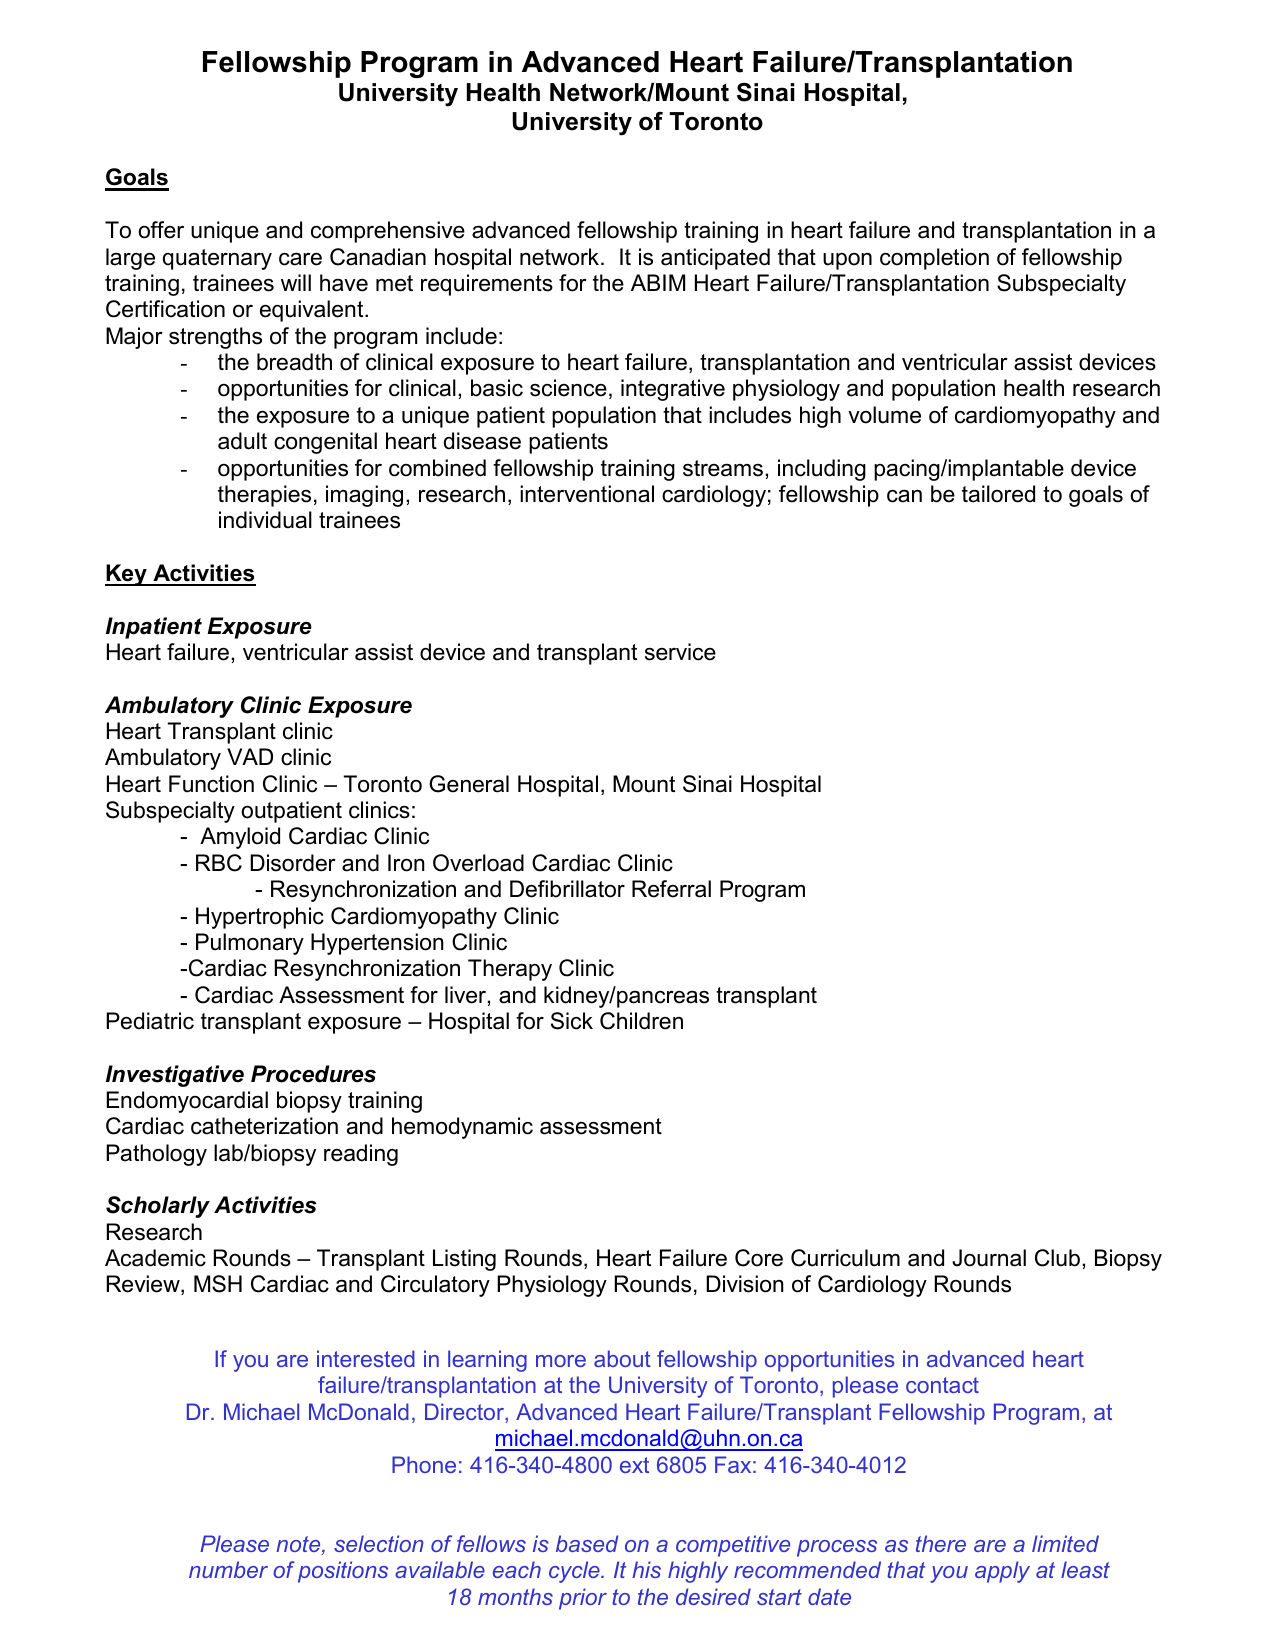 Fellowship Program in Advanced Heart Failure/Transplantation